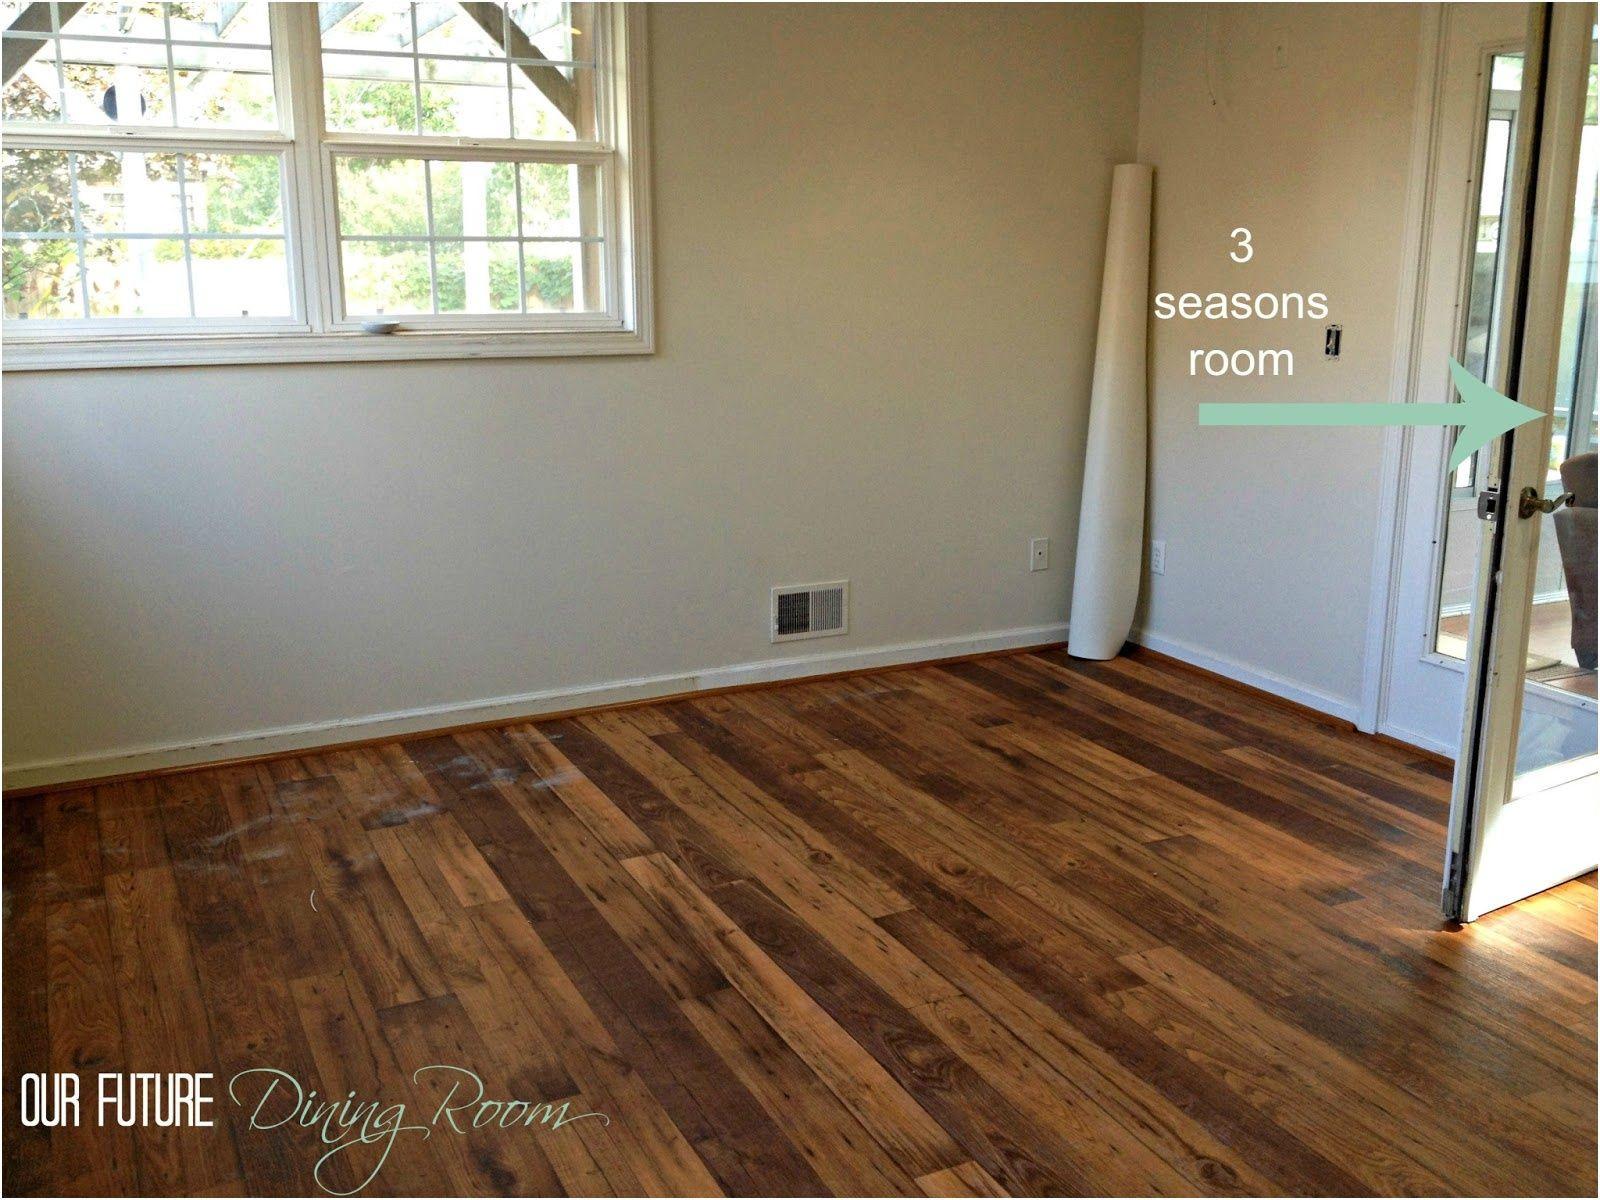 Home Depot Vinyl Hardwood Flooring Of Plank Linoleum Rolls